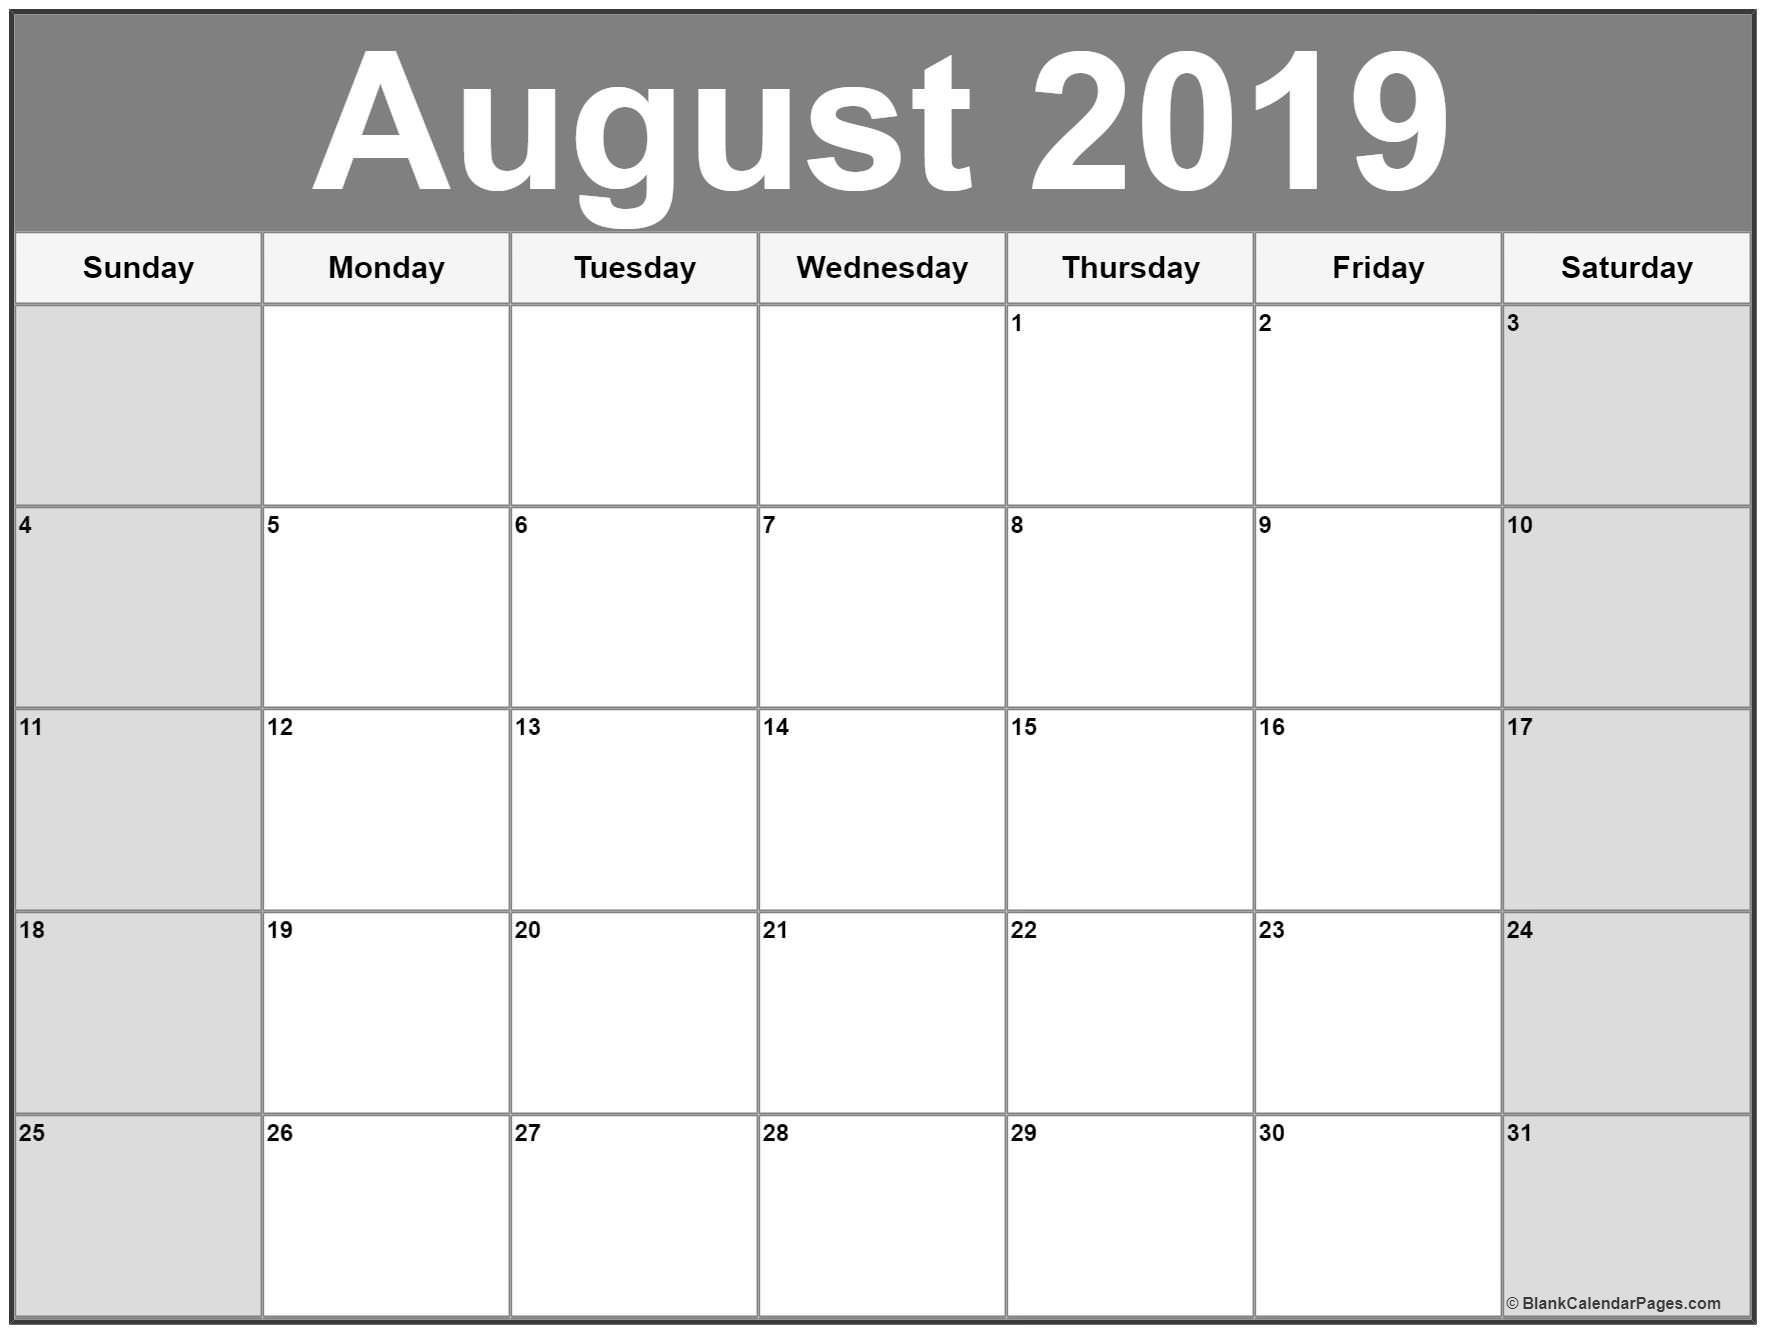 August 2019 Calendar Printable Free | Calendar Printables-January 2020 Calendar Canada Printable